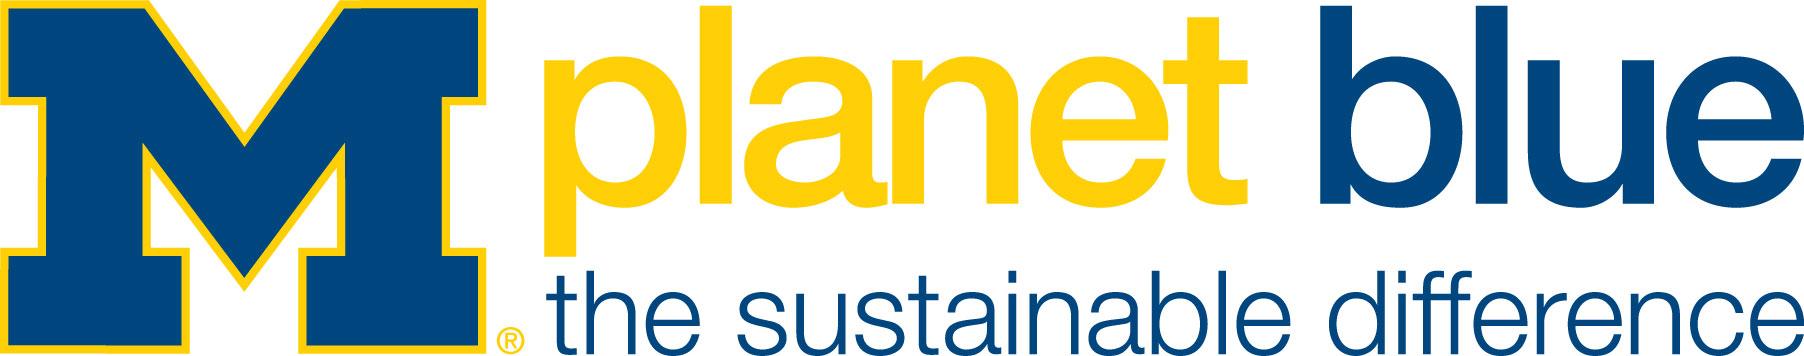 planetblue-logo 2